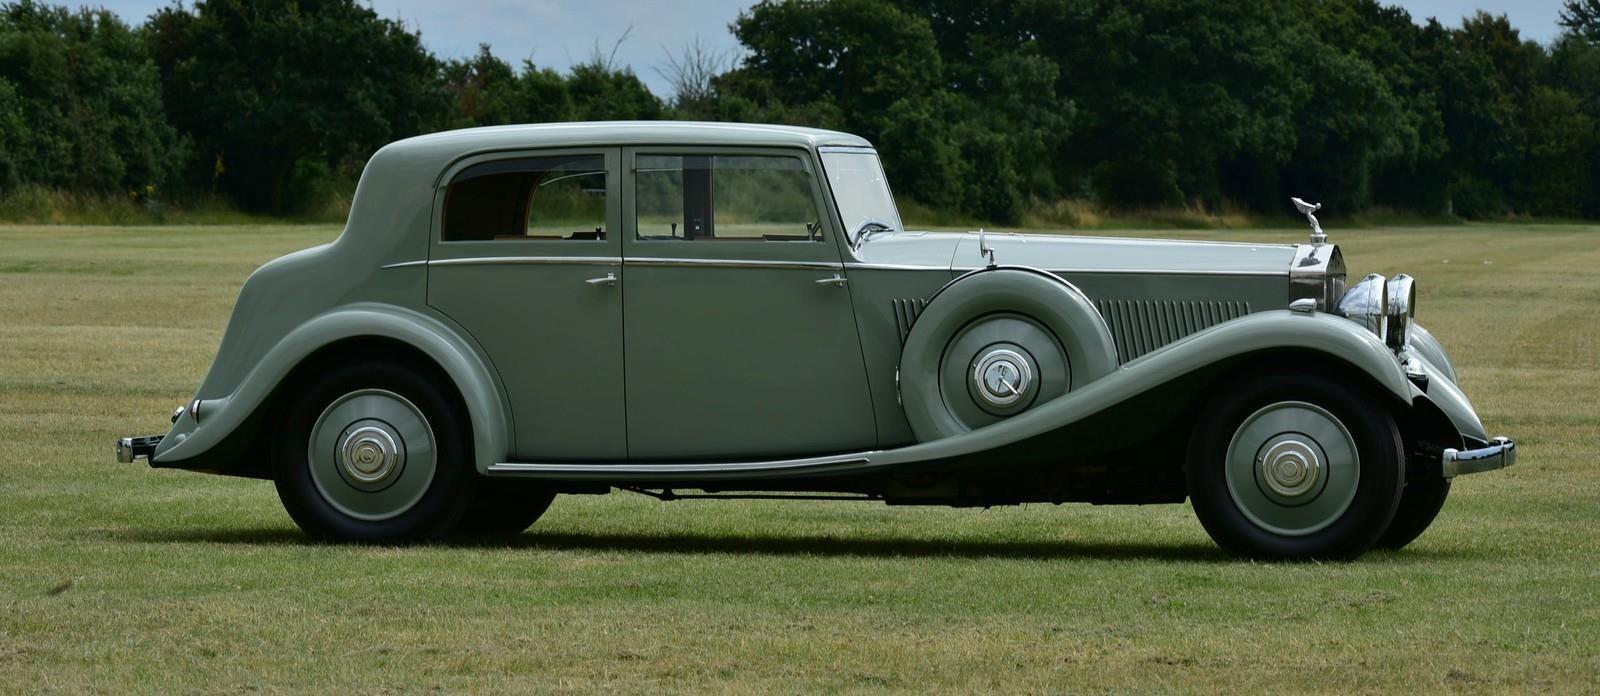 Rolls-Royce Phantom II Sports Saloon (James Young)   Assorted ...